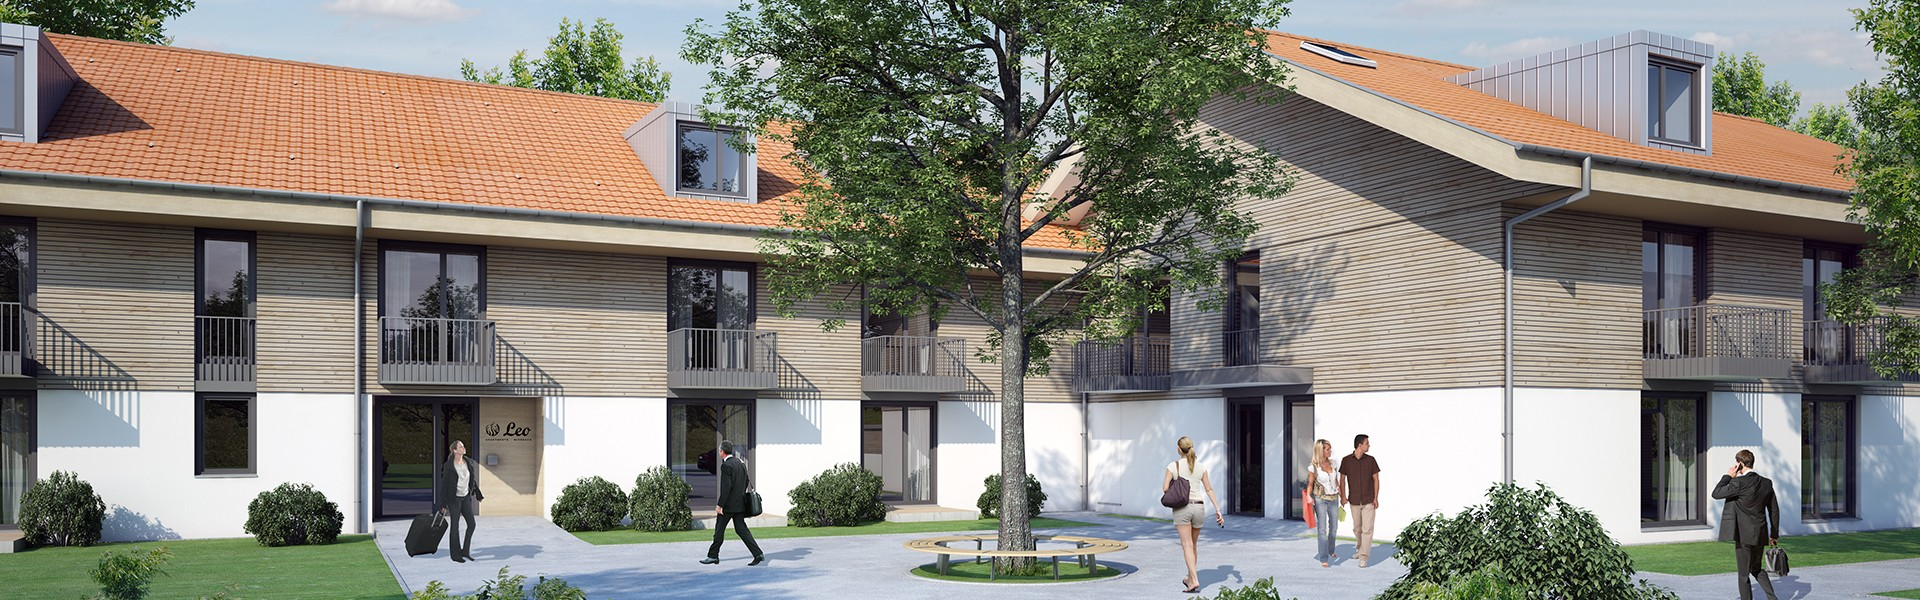 Boarding House Miesbach